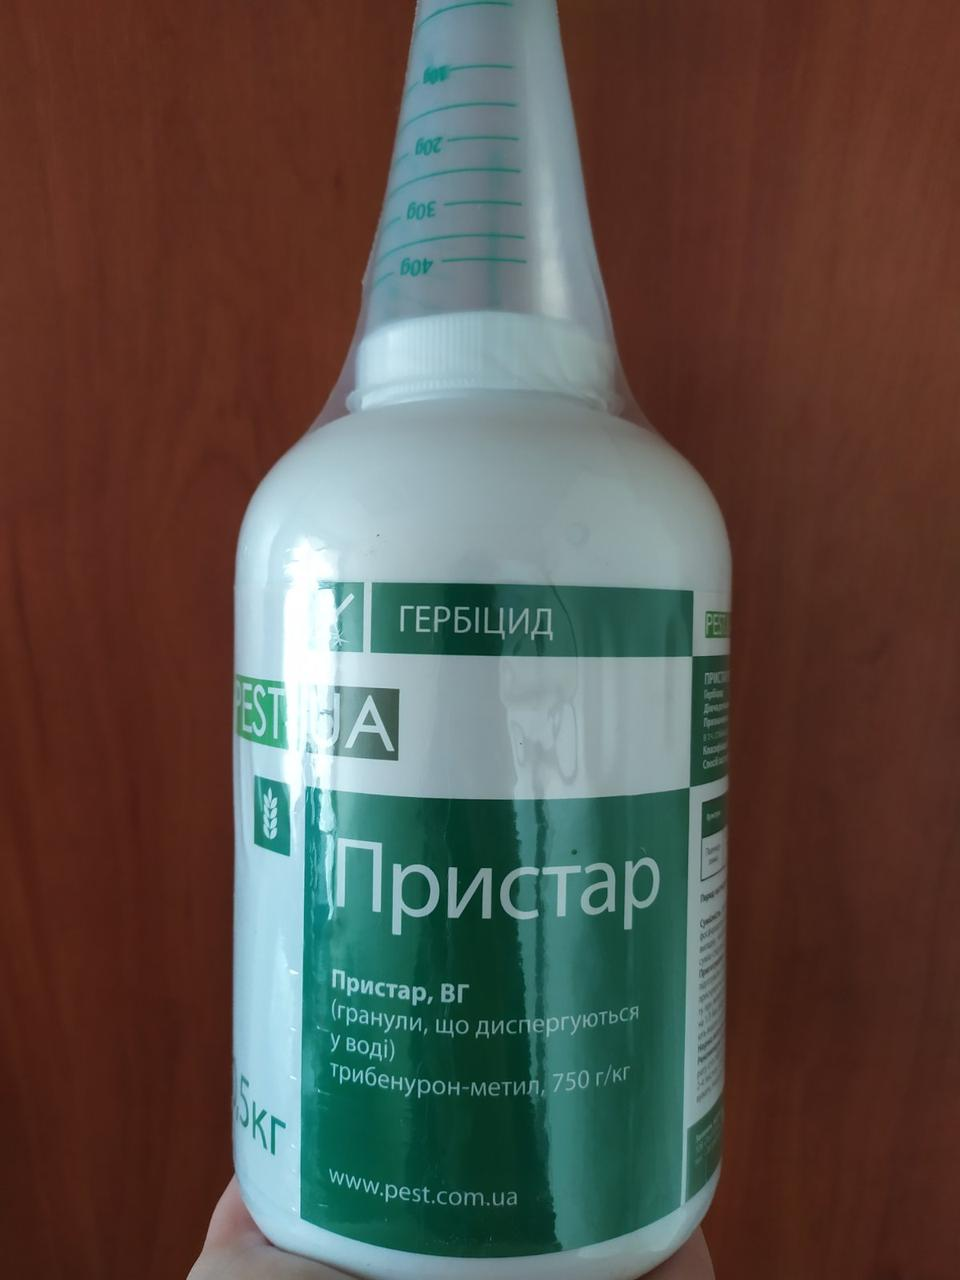 Пристар (Трибенурон-метил, 750 г/кг)